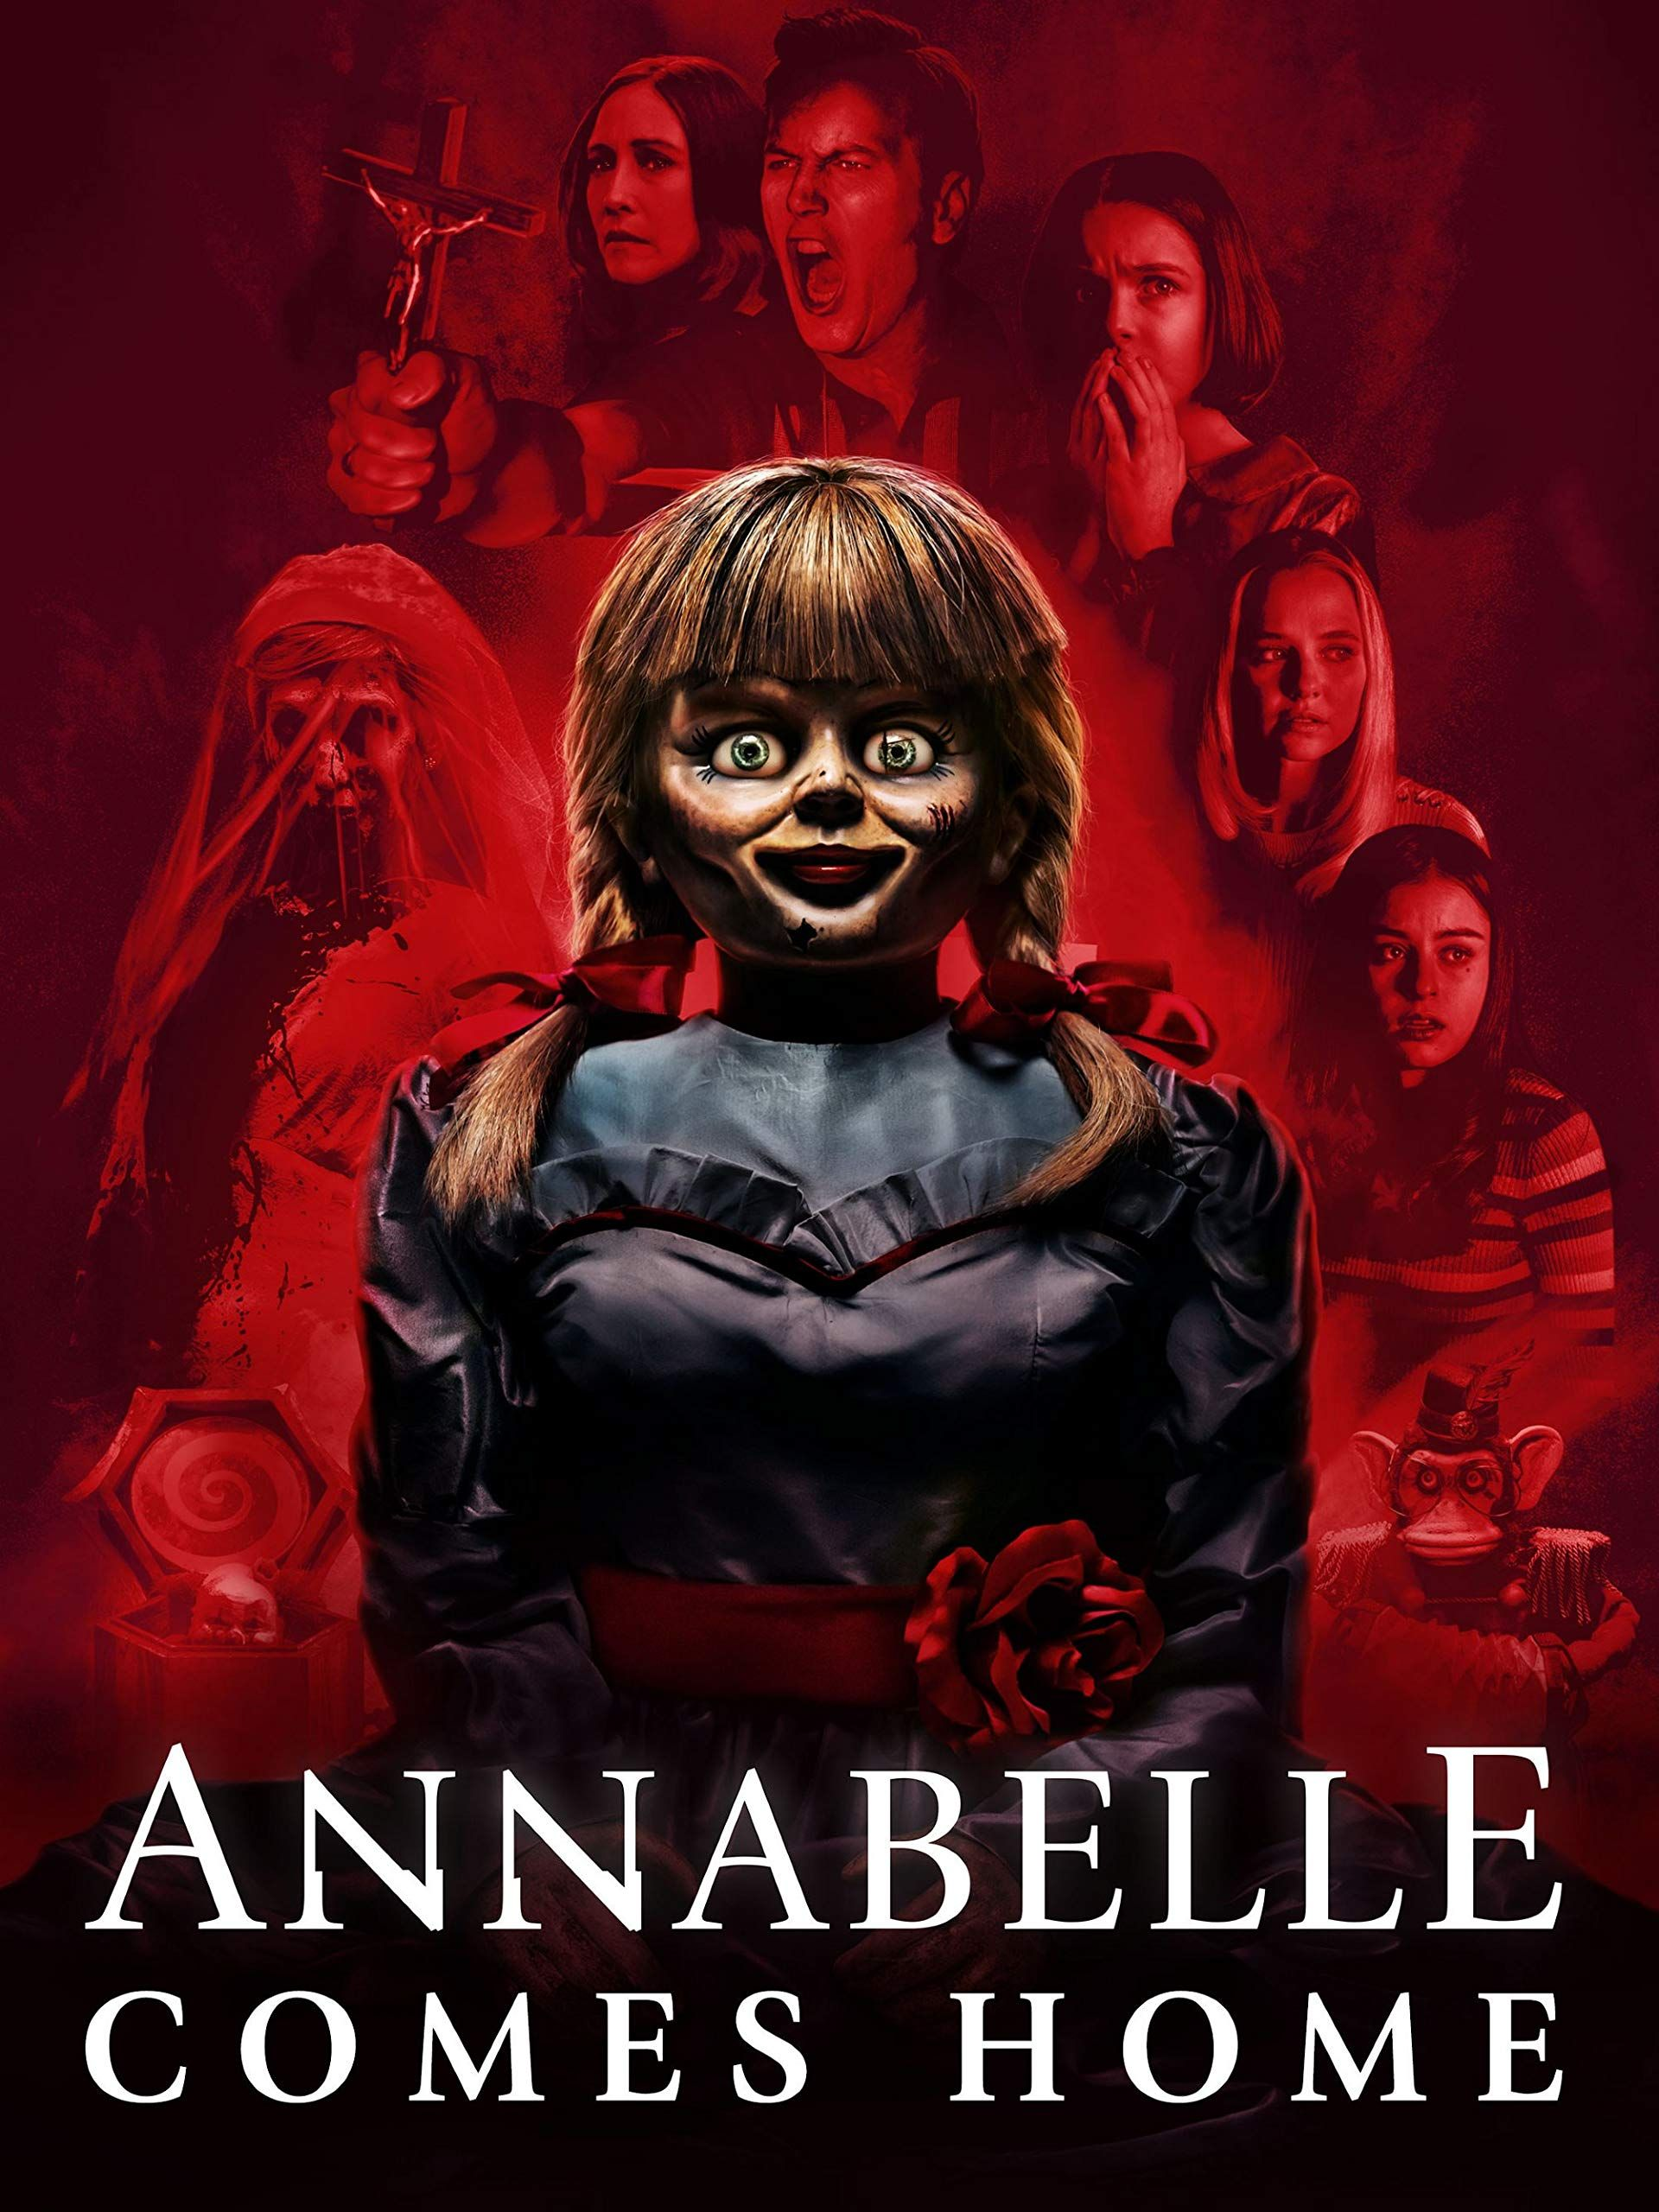 Annabelle Comes Home Peliculas De Terror Antiguas Peliculas De Terror Peliculas Completas Gratis